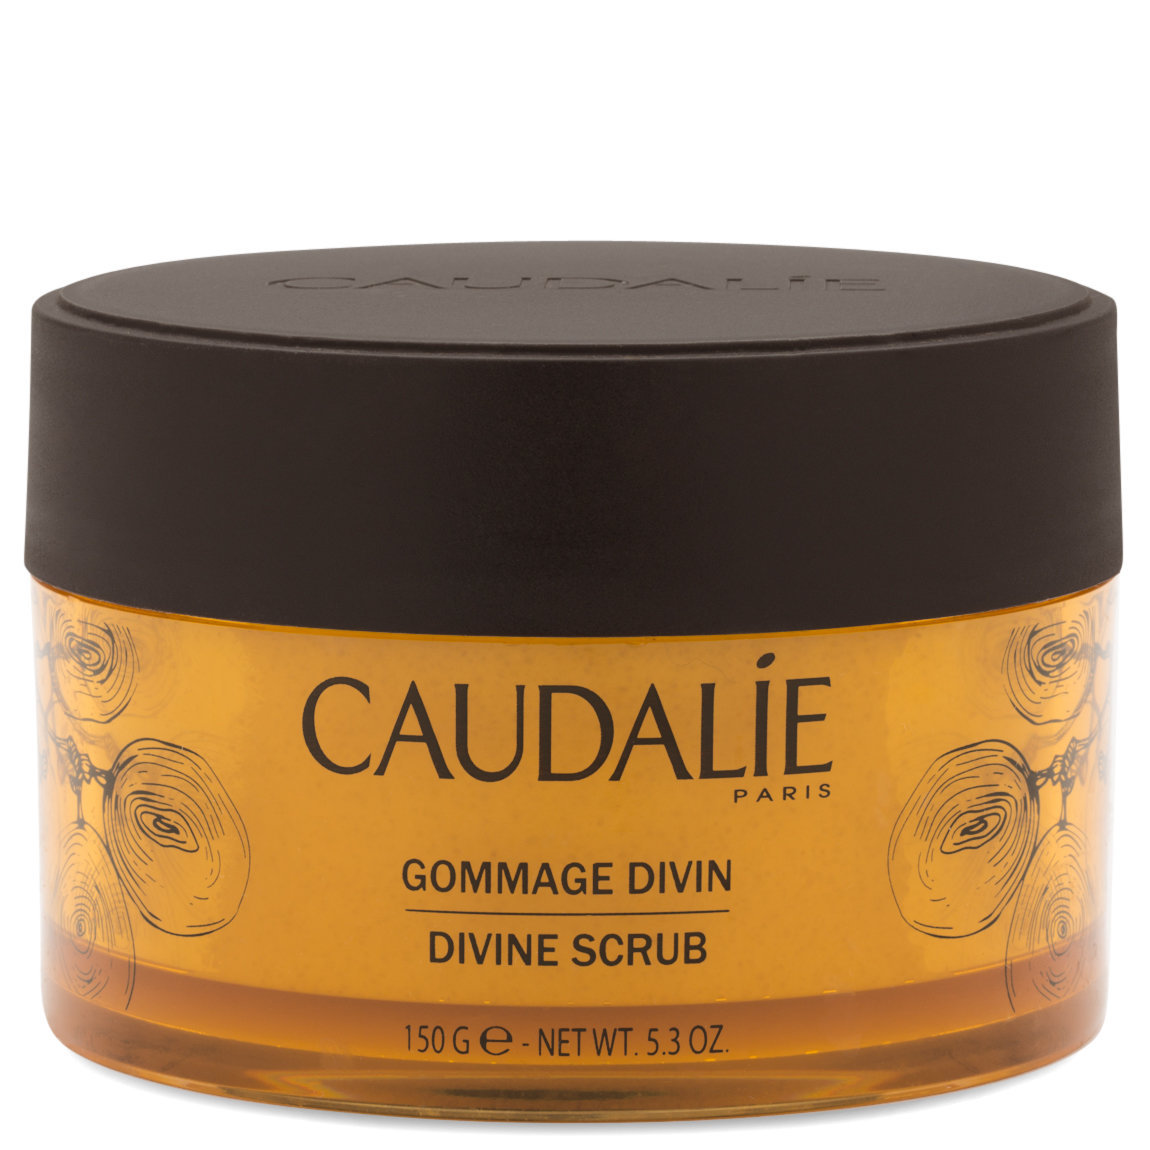 Caudalie Divine Scrub product swatch.